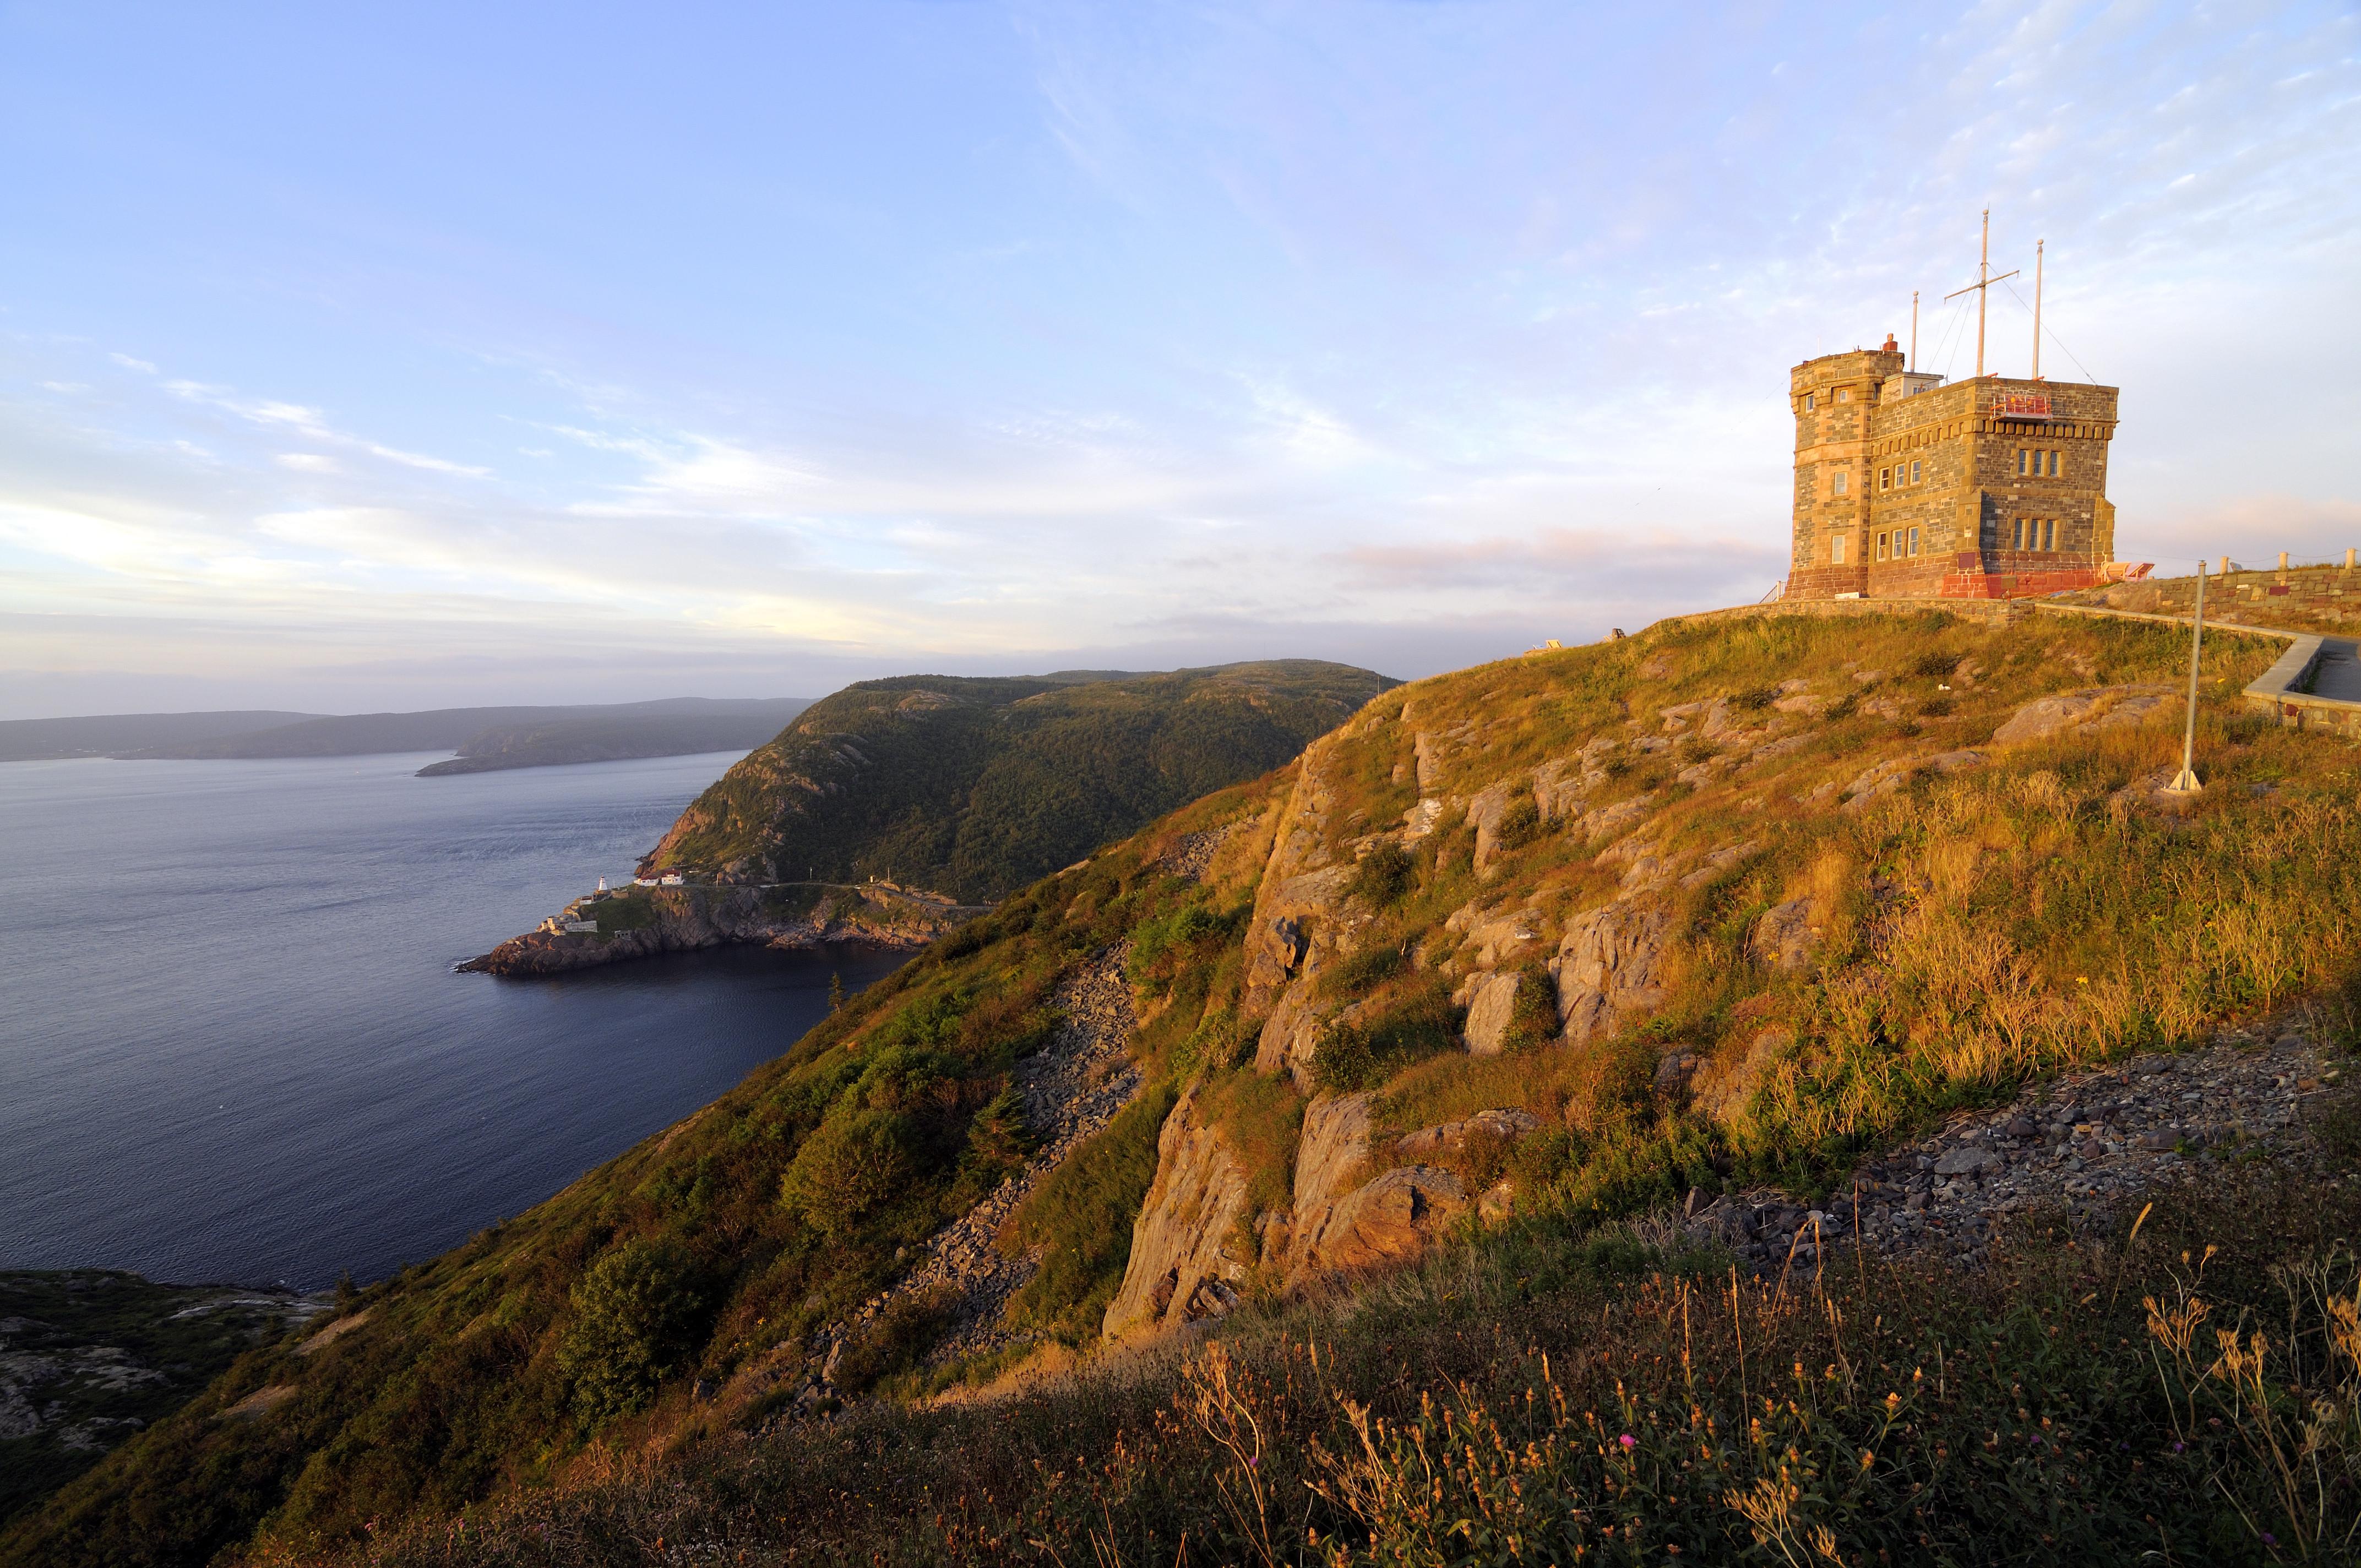 Signal Hill and Coastal Newfoundland